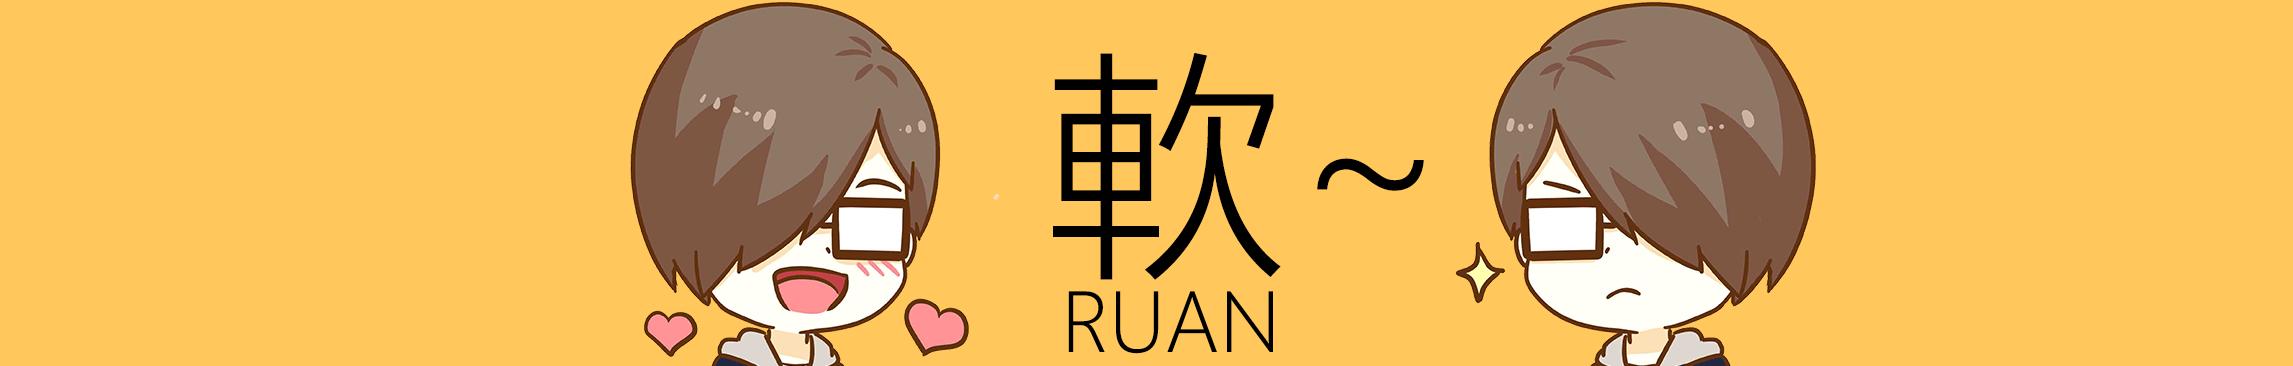 NLRanD banner